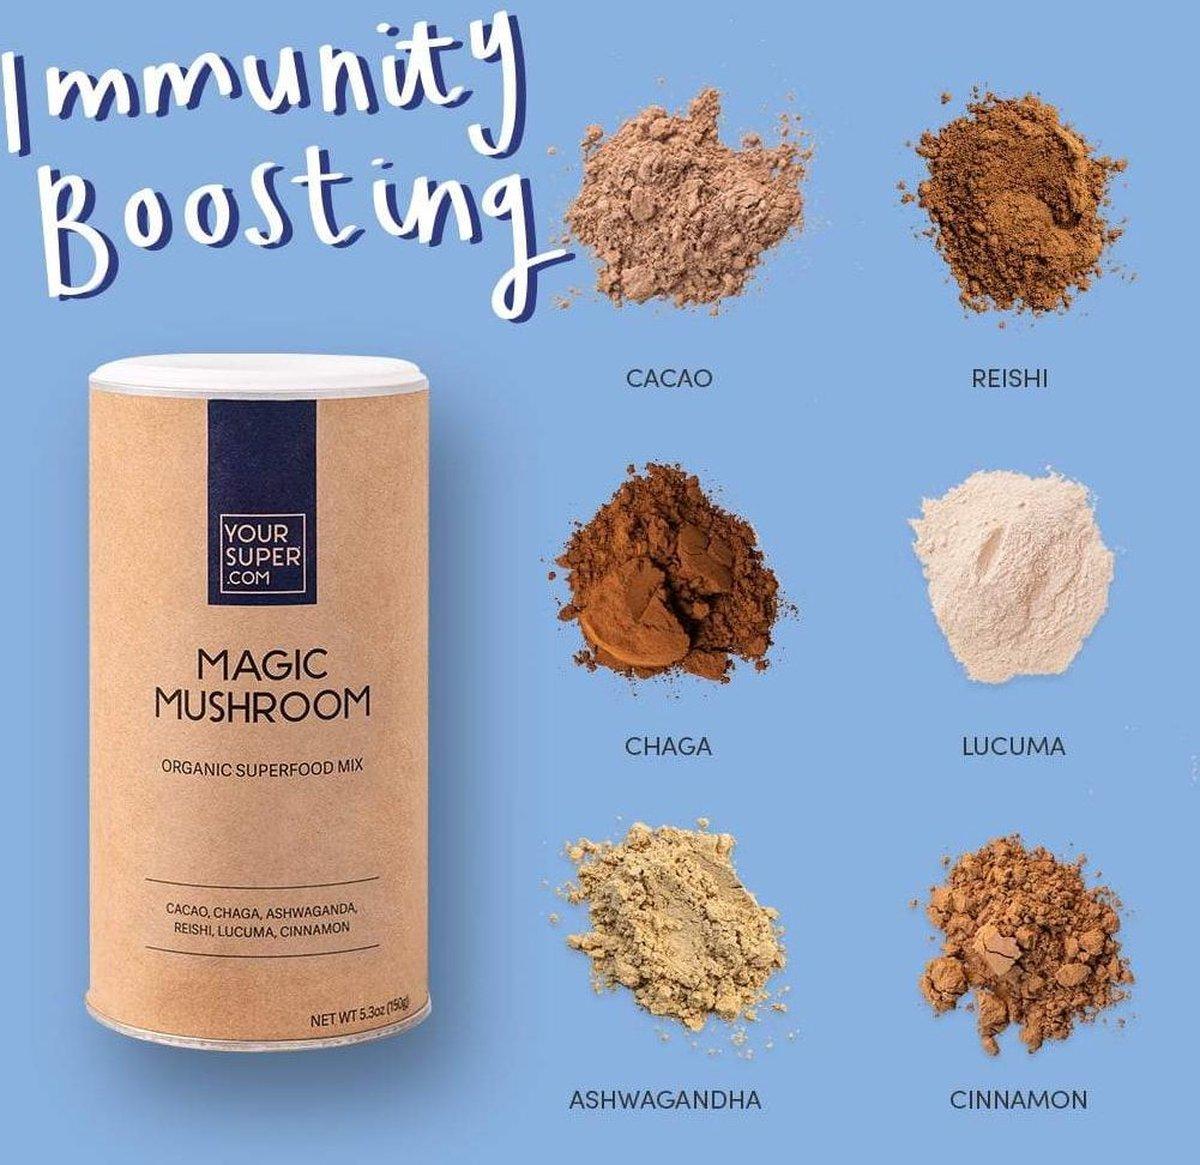 Your Super - MAGIC MUSHROOM - Organic Superfood Mix - Plantaardig - Verbeter humeur en immuunsysteem